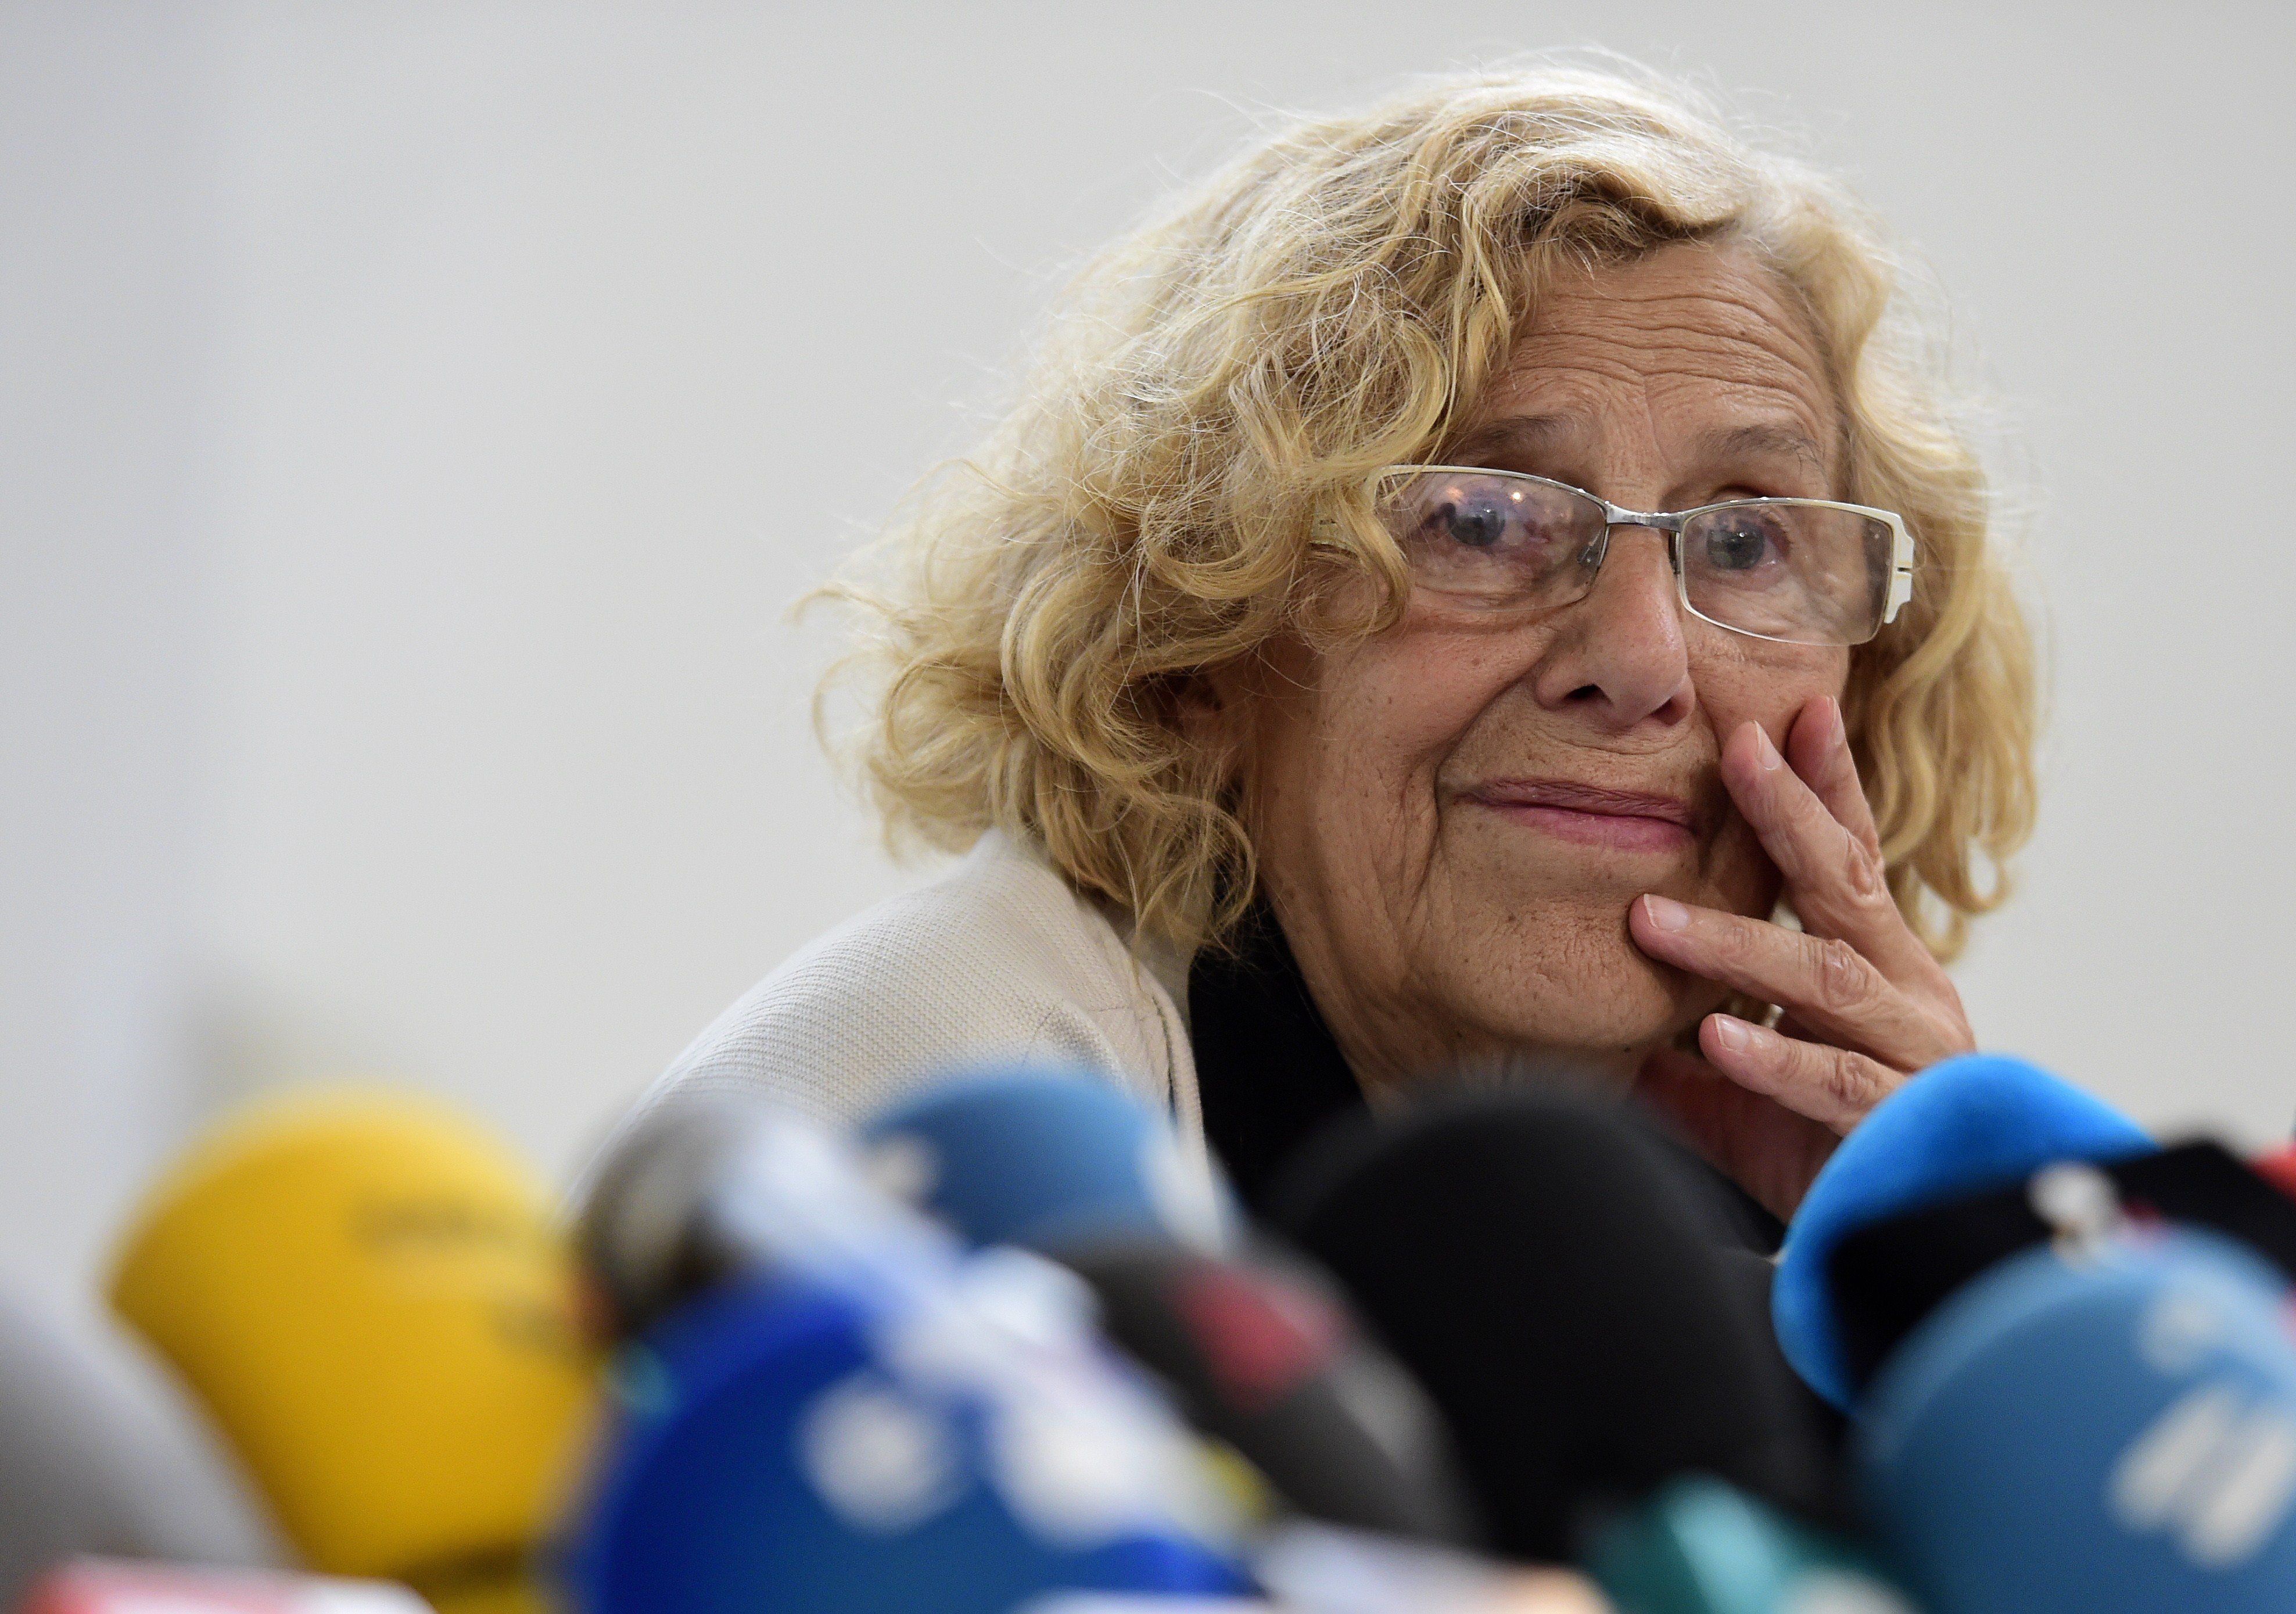 Mayor of Madrid Manuela Carmena came out of retirement andcaptured the imagination of Spanish politics.